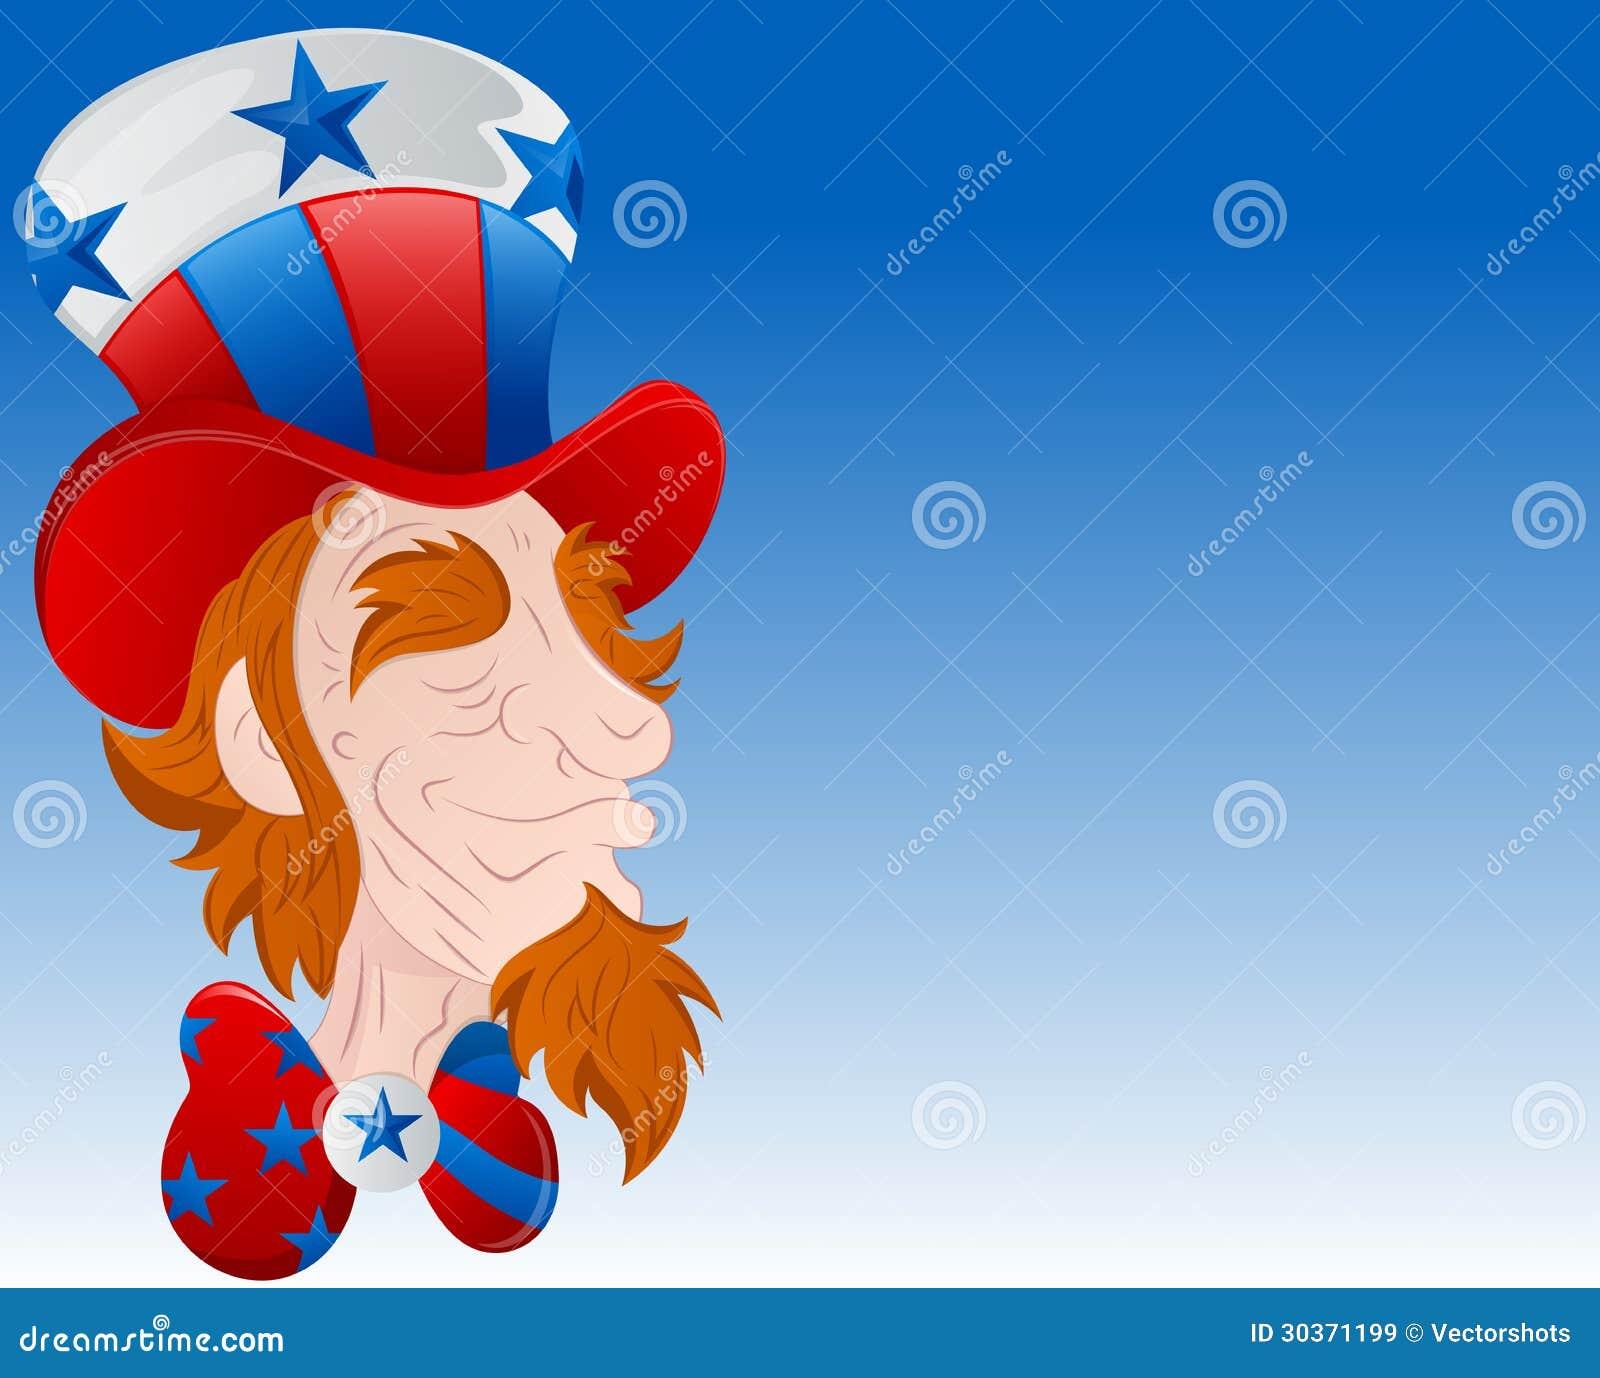 Close Up Characters Cartoon 01 : Uncle sam face closeup vector royalty free stock images